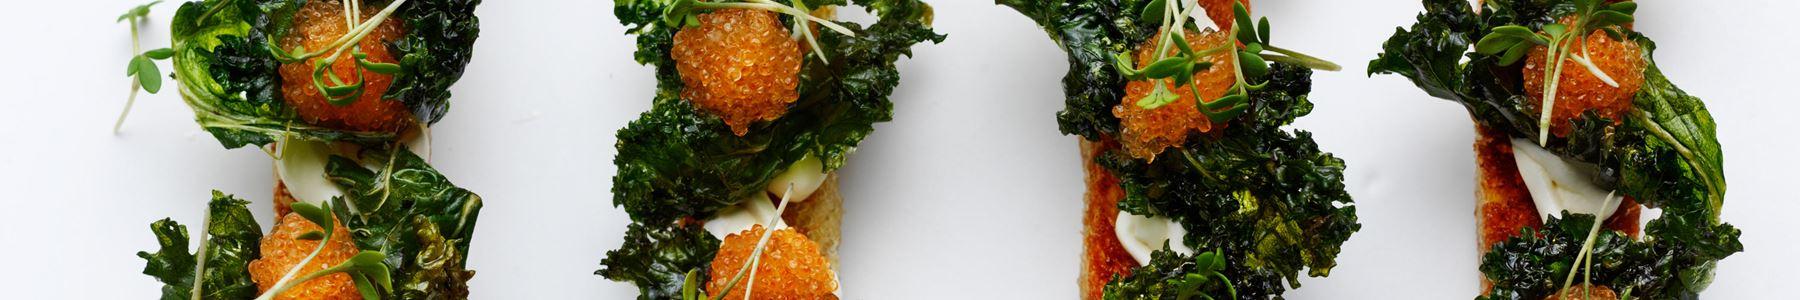 Grønkål + Snacks og tapas